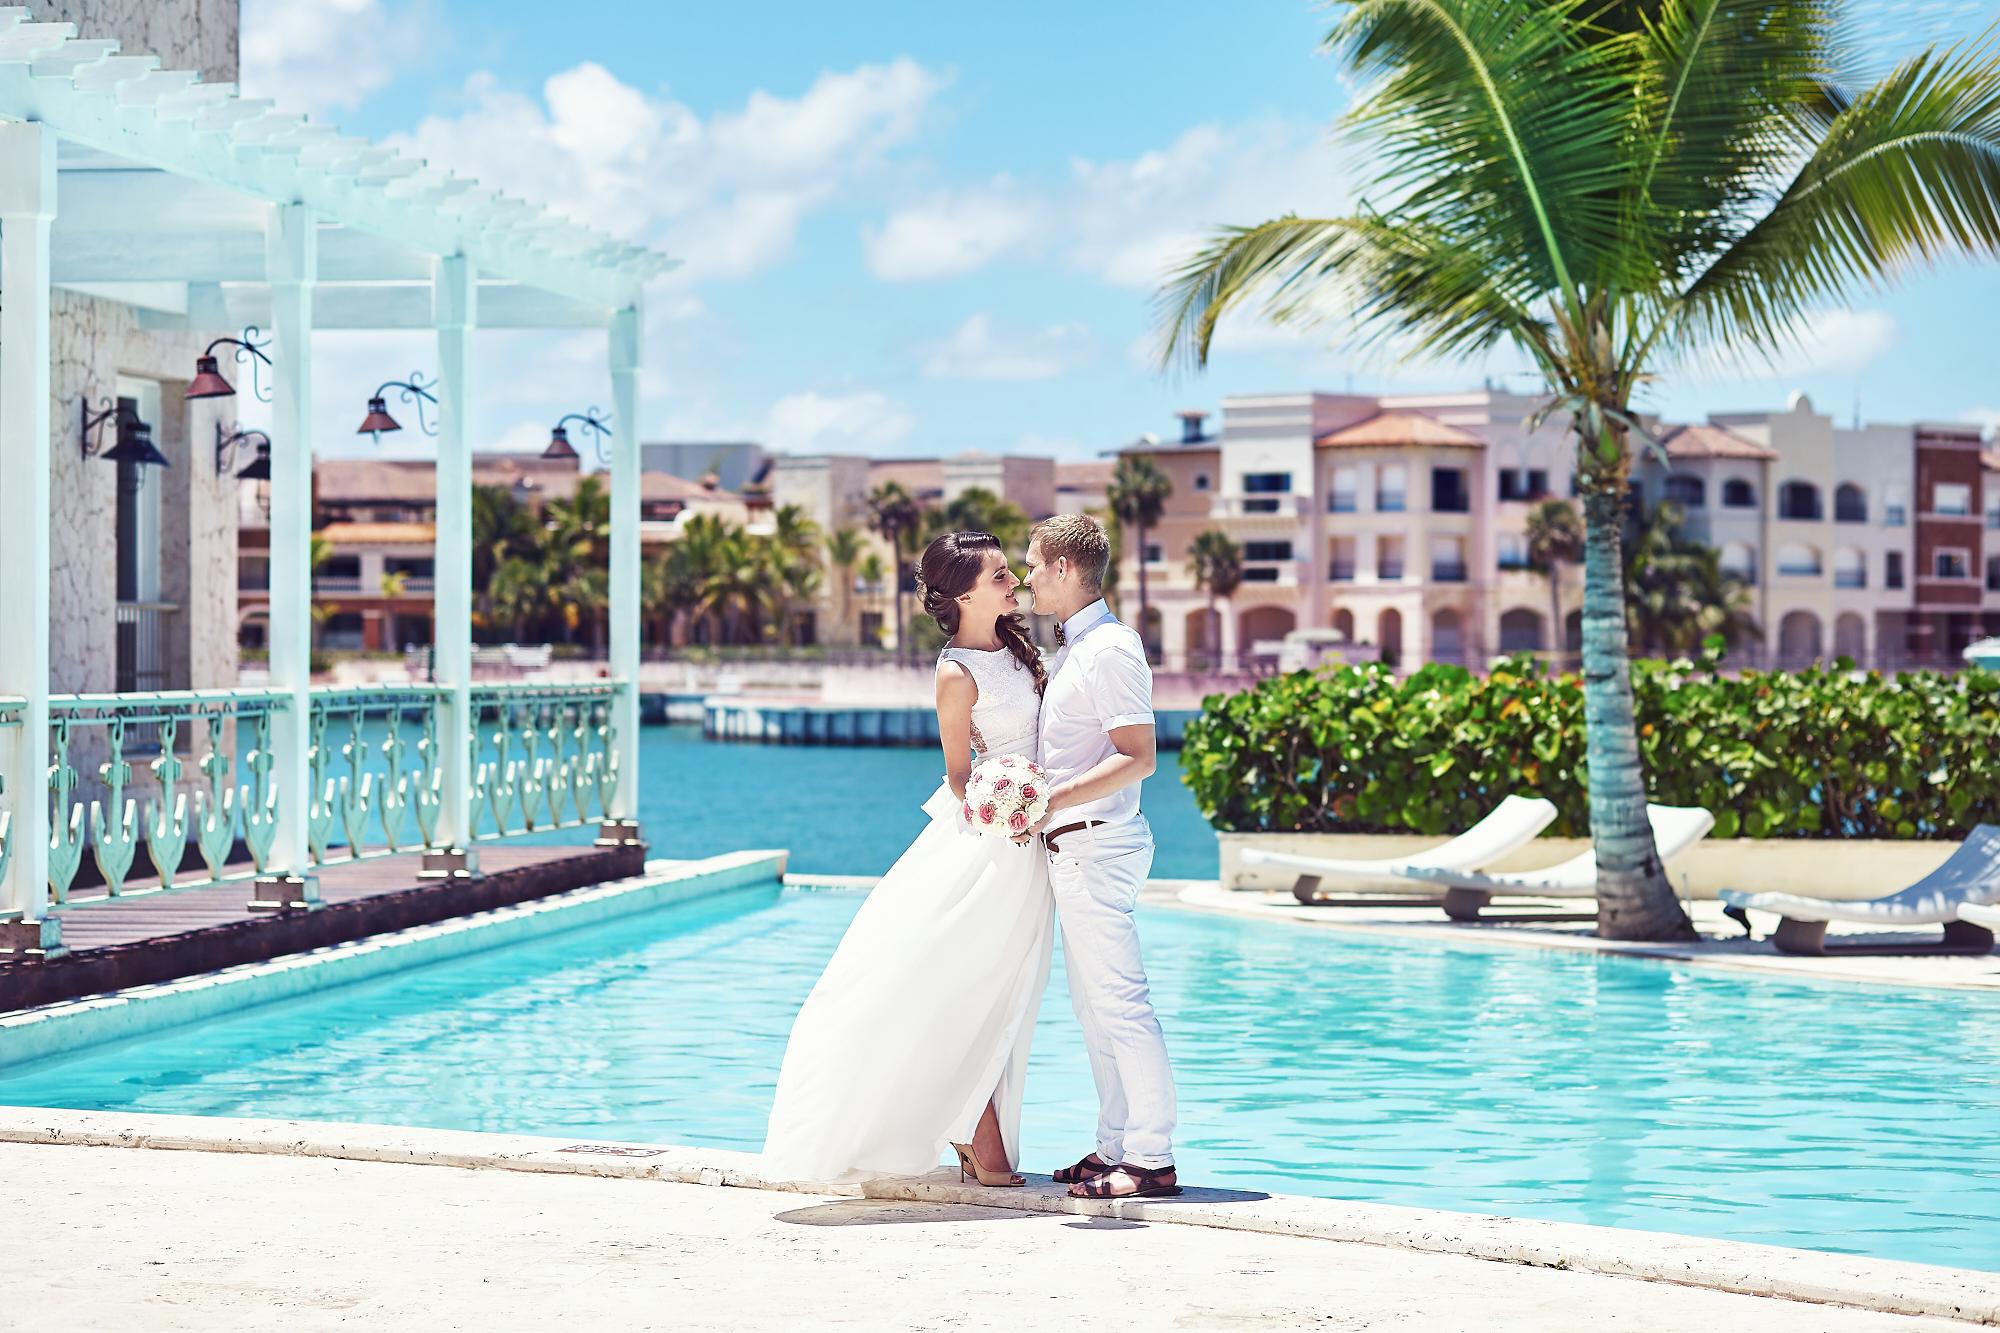 фотосессия свадьба в доминикане